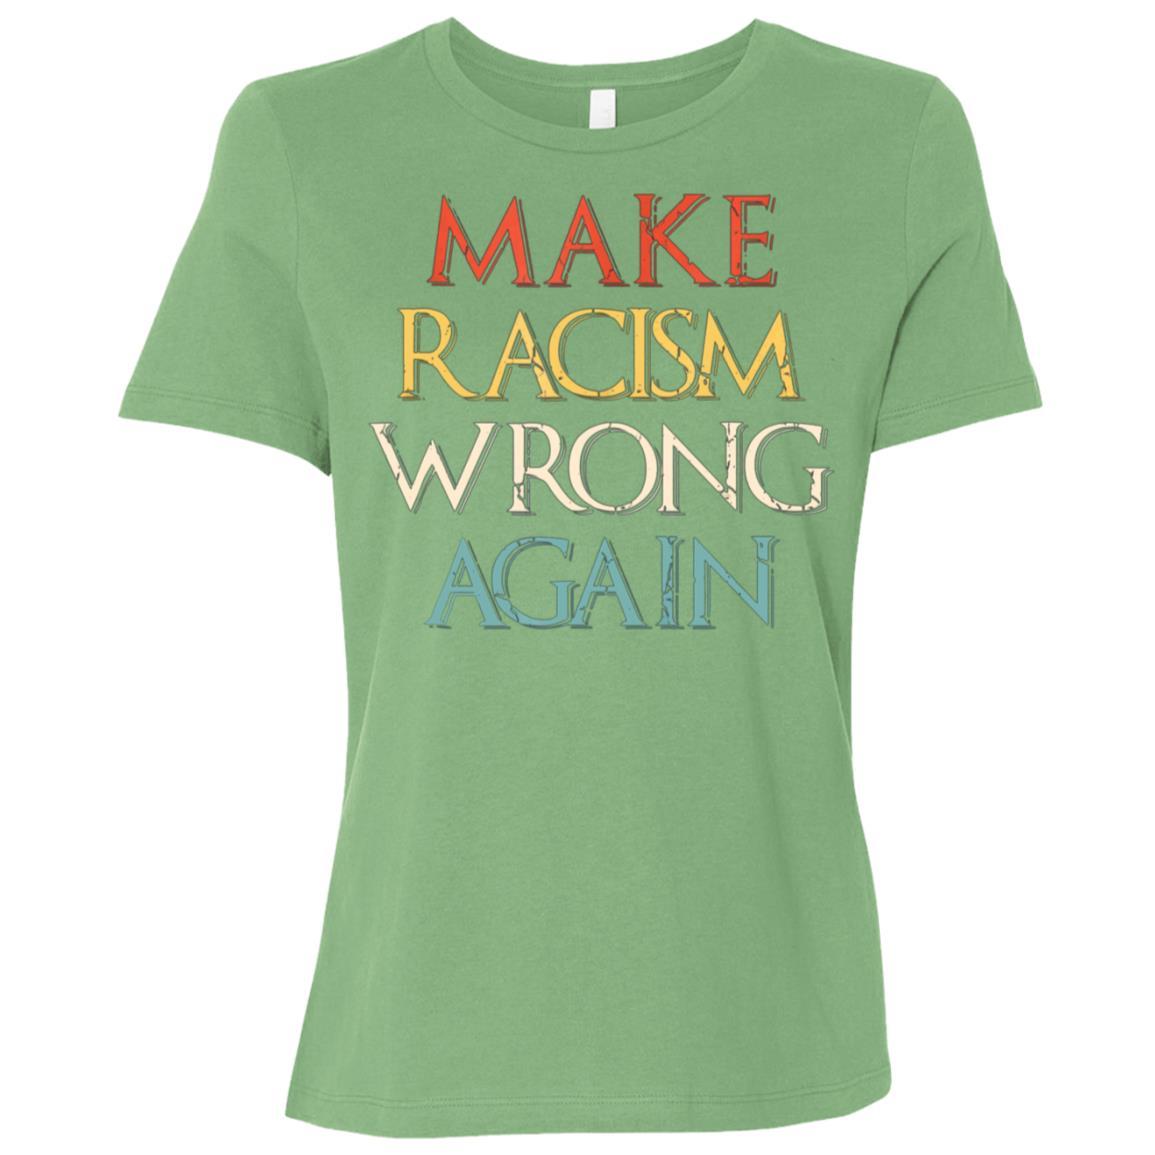 Make Racism Wrong Again Anti-Hate 86 45 Resist Women Short Sleeve T-Shirt